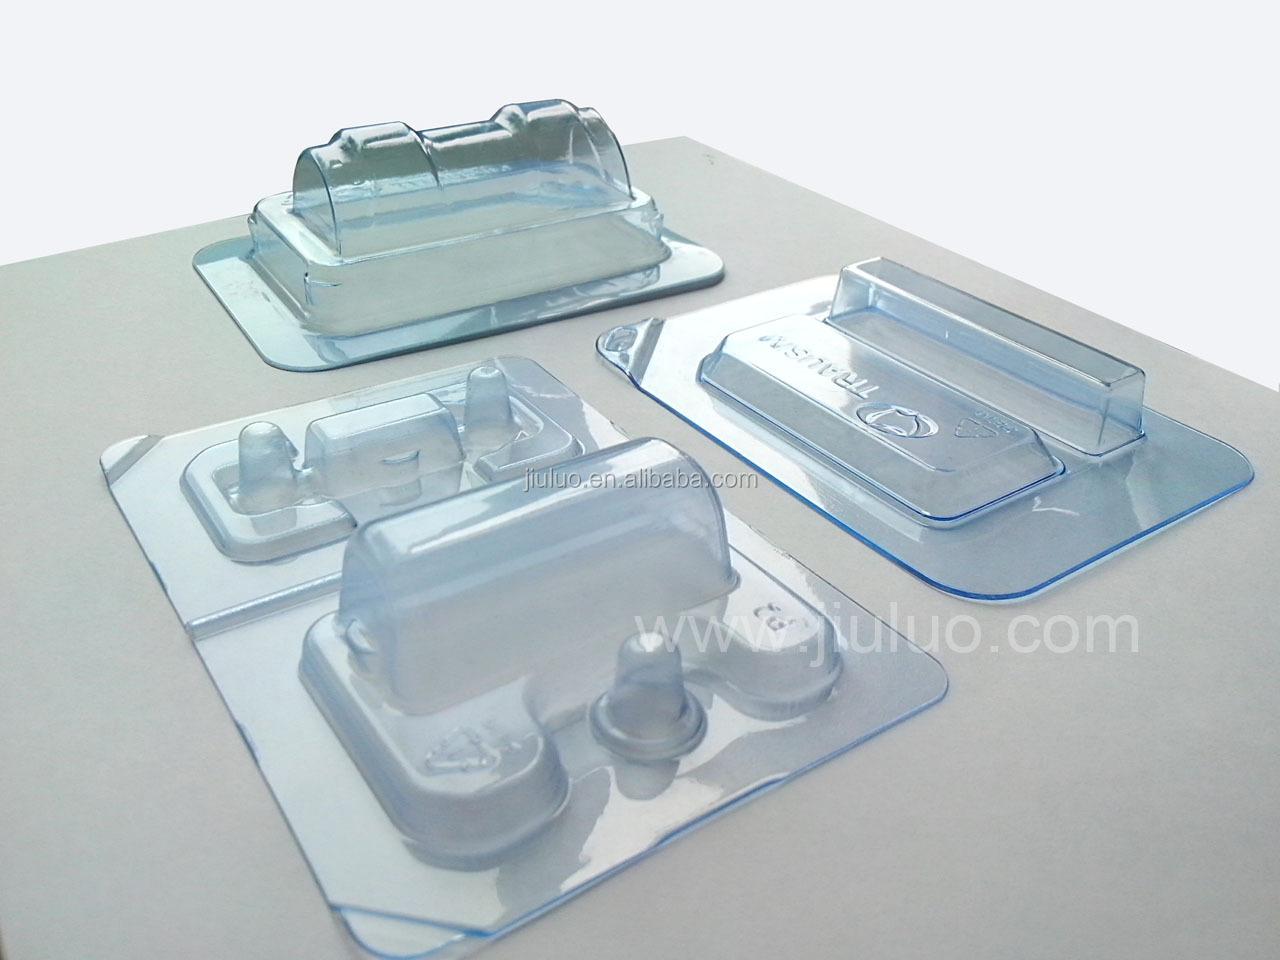 Dental Implants Blister Packaging Sealing Machine Buy